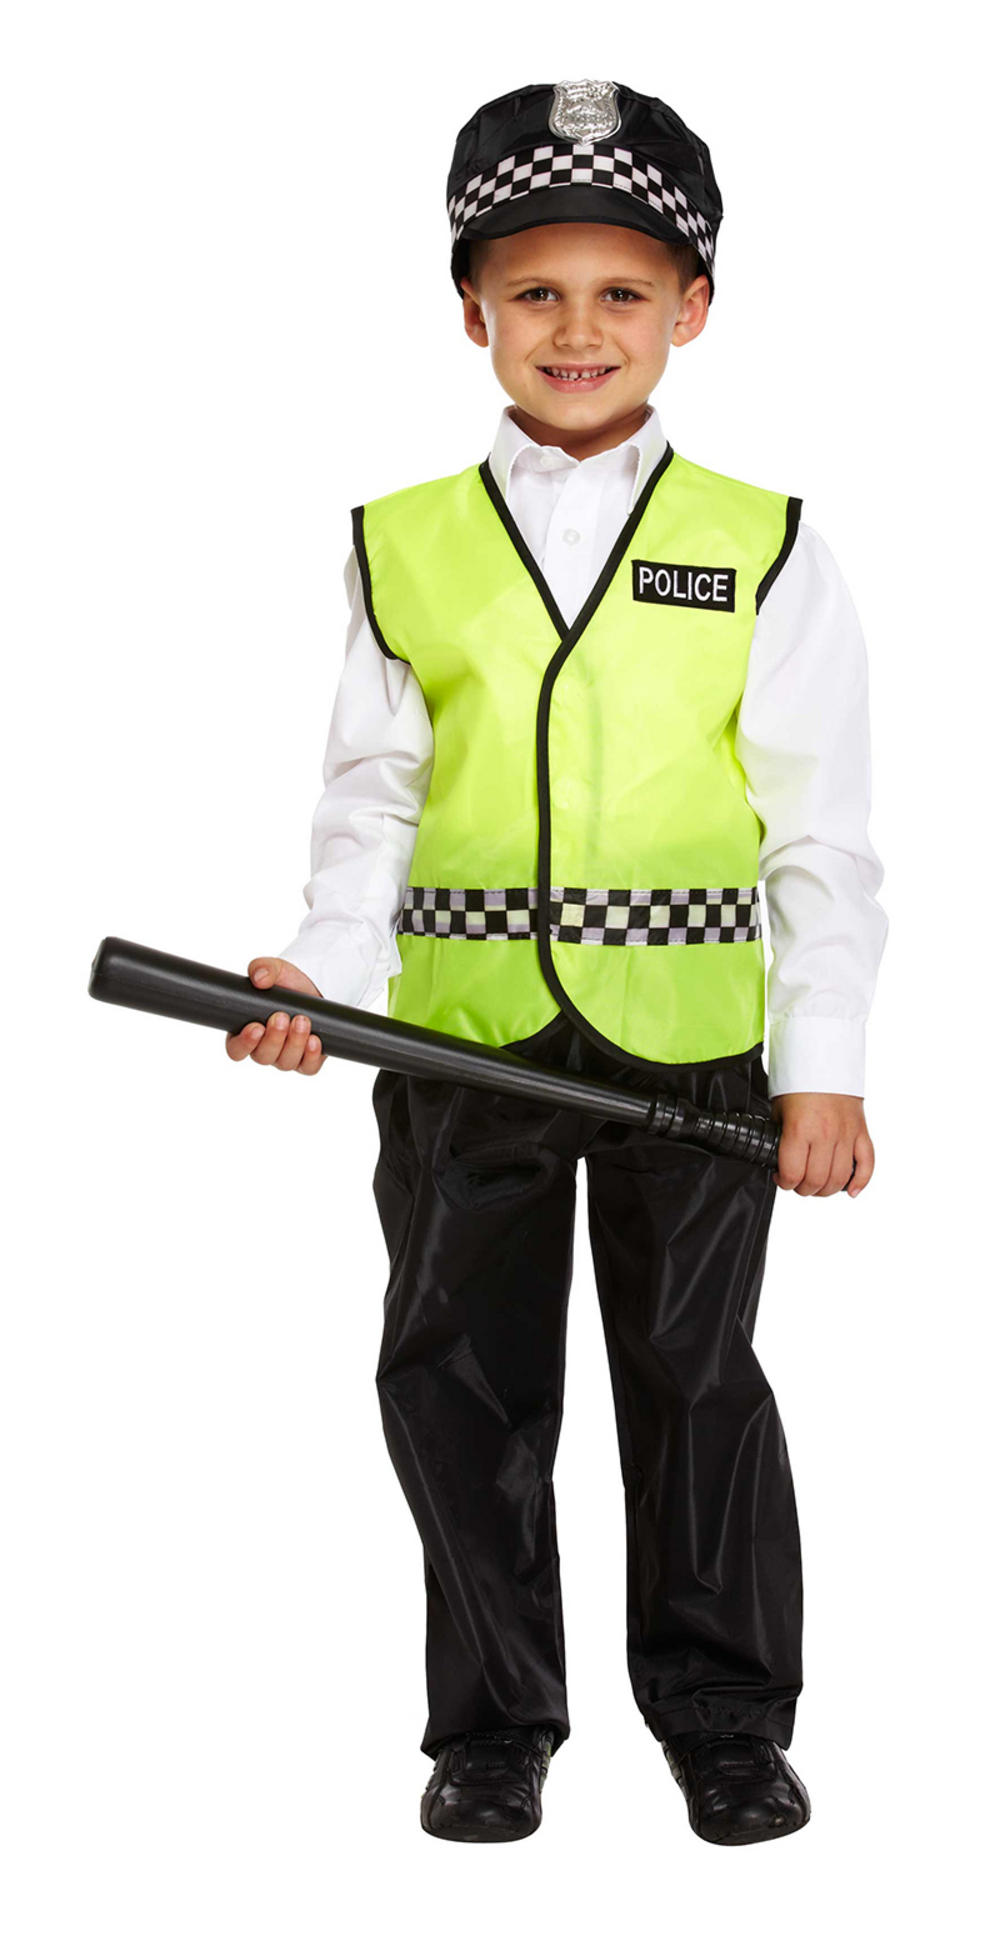 Policeman Kids Costume  sc 1 st  Mega Fancy Dress & Policeman Kids Costume   Boyu0027s World Book Day Fancy Dress Costumes ...